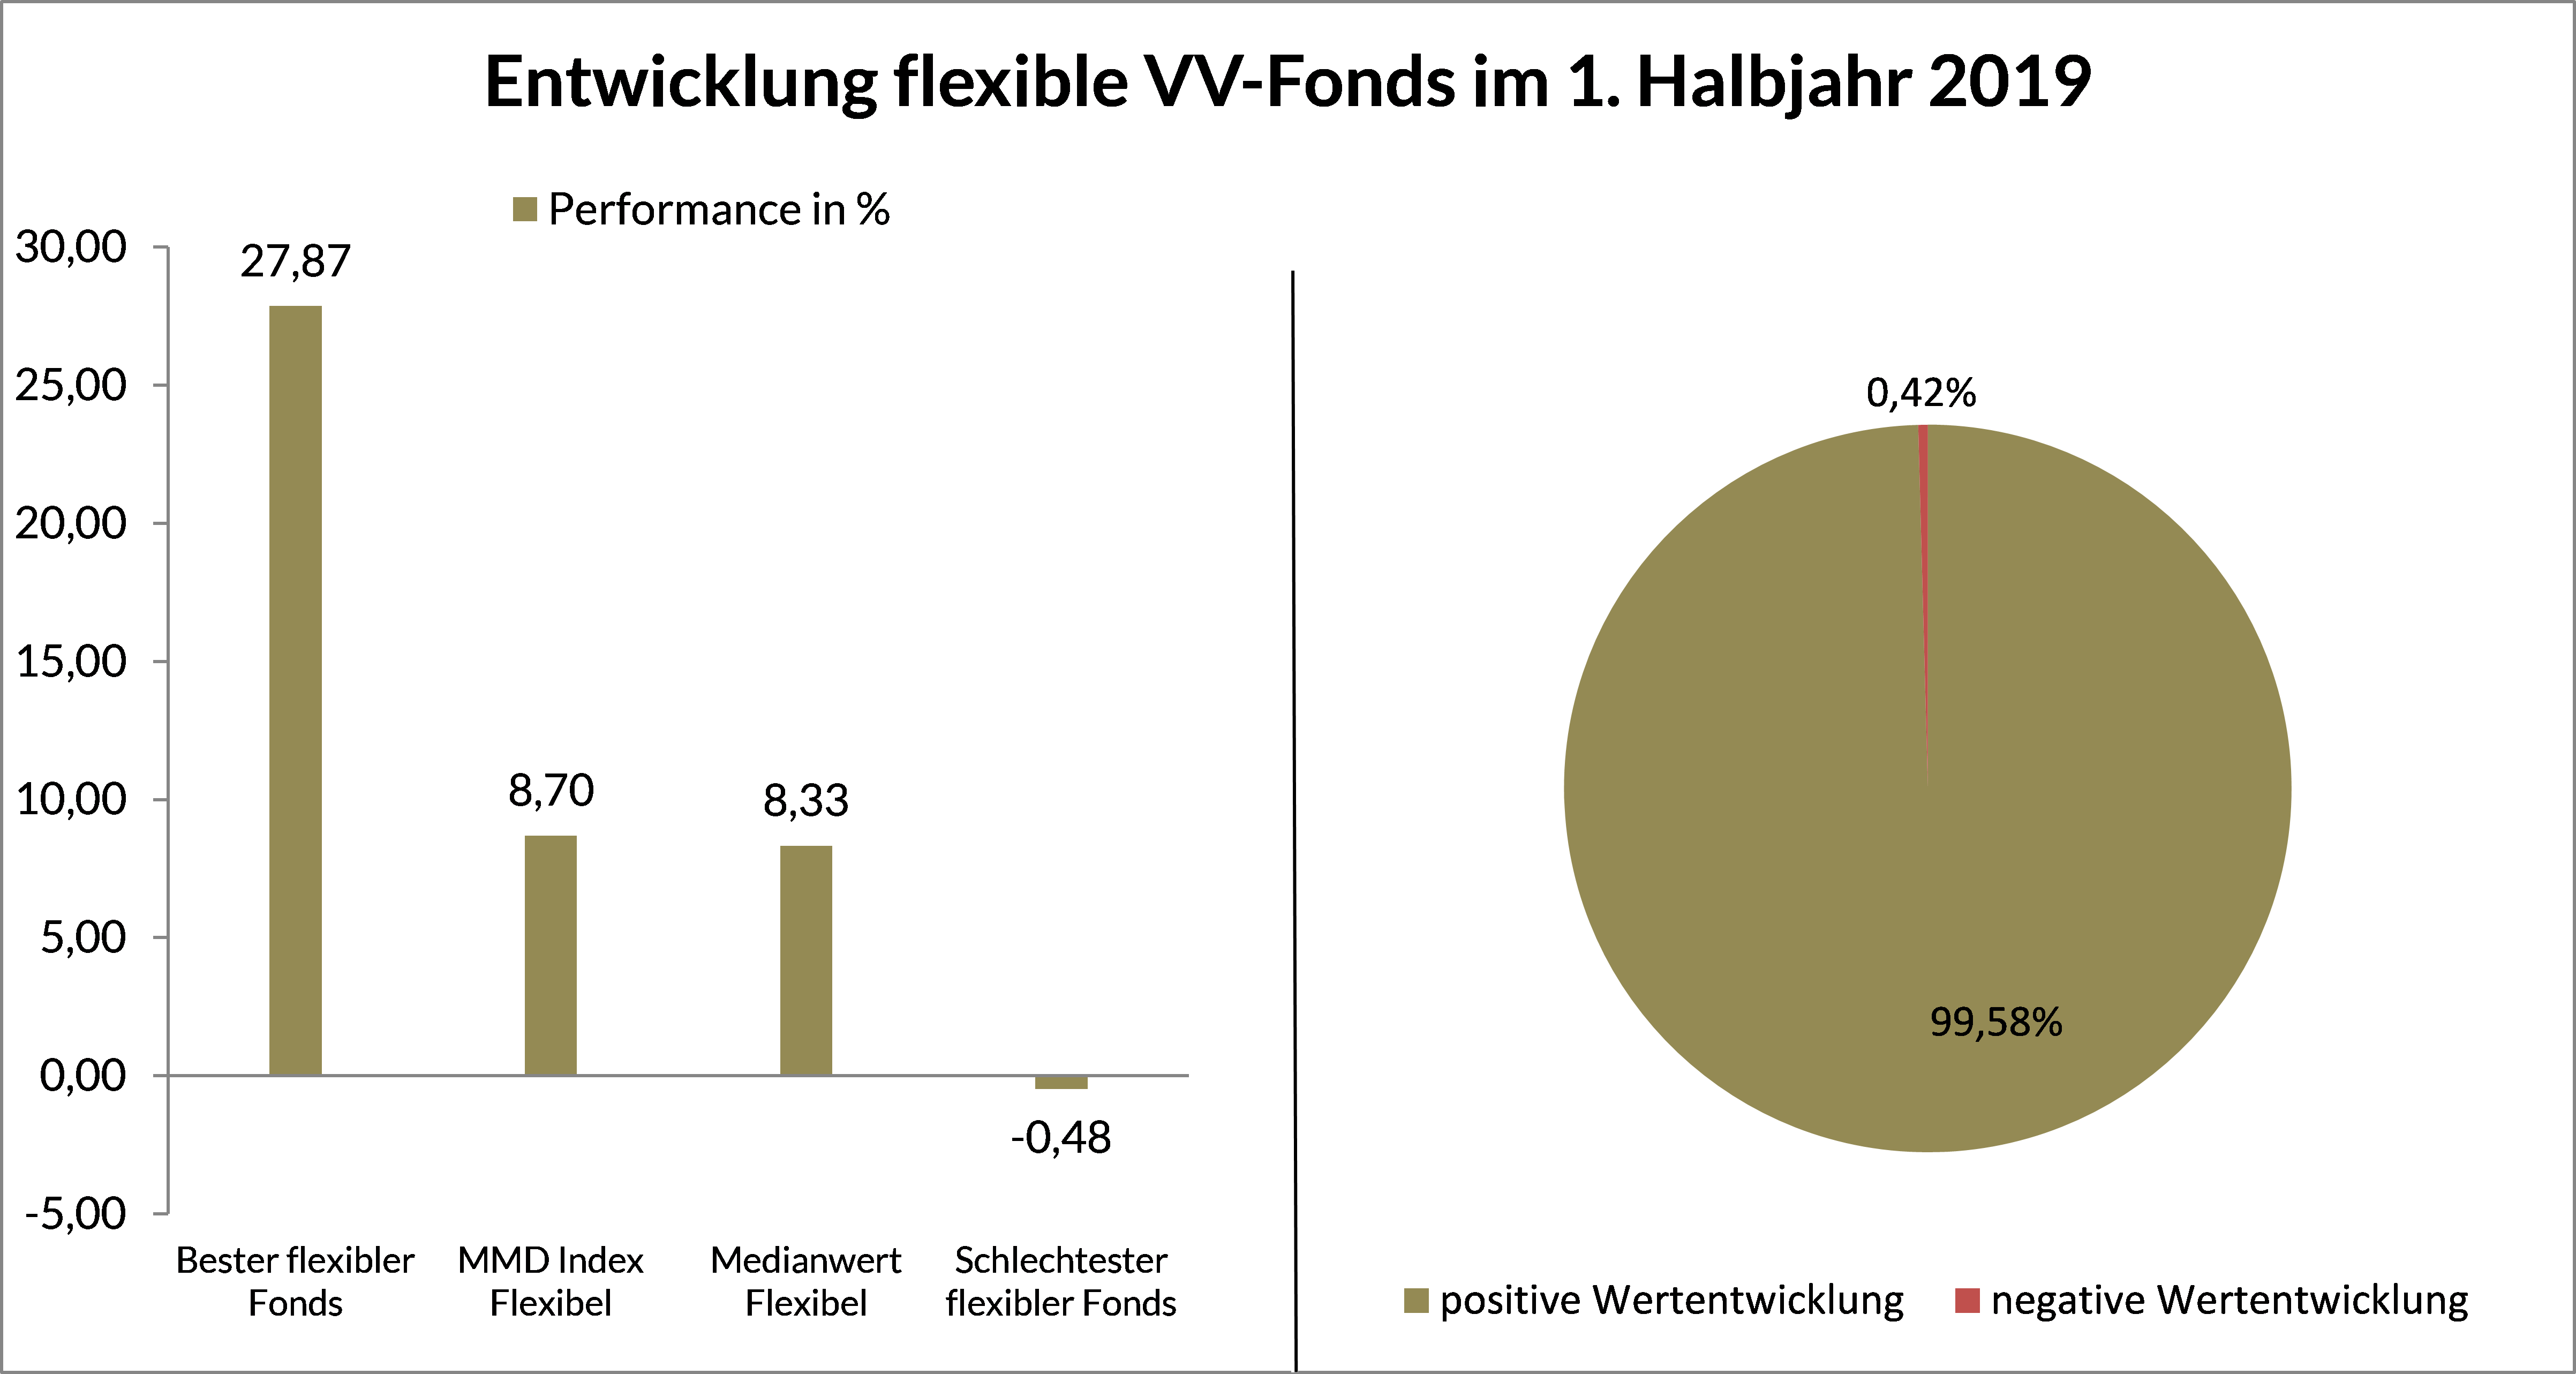 Grafik 5 - Entwicklung flexible VV-Fonds HJ 1 2019